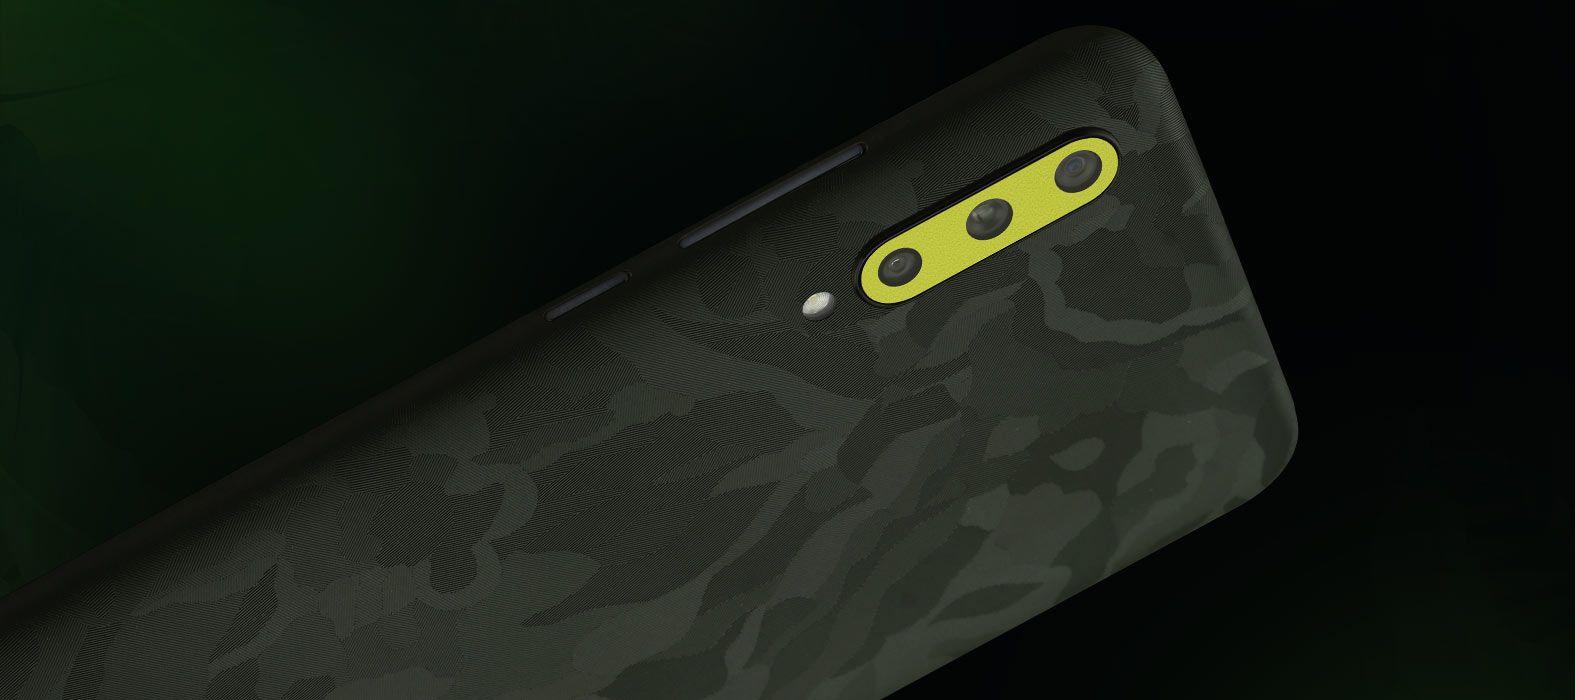 Mi-A3-Green-Camo-Skins